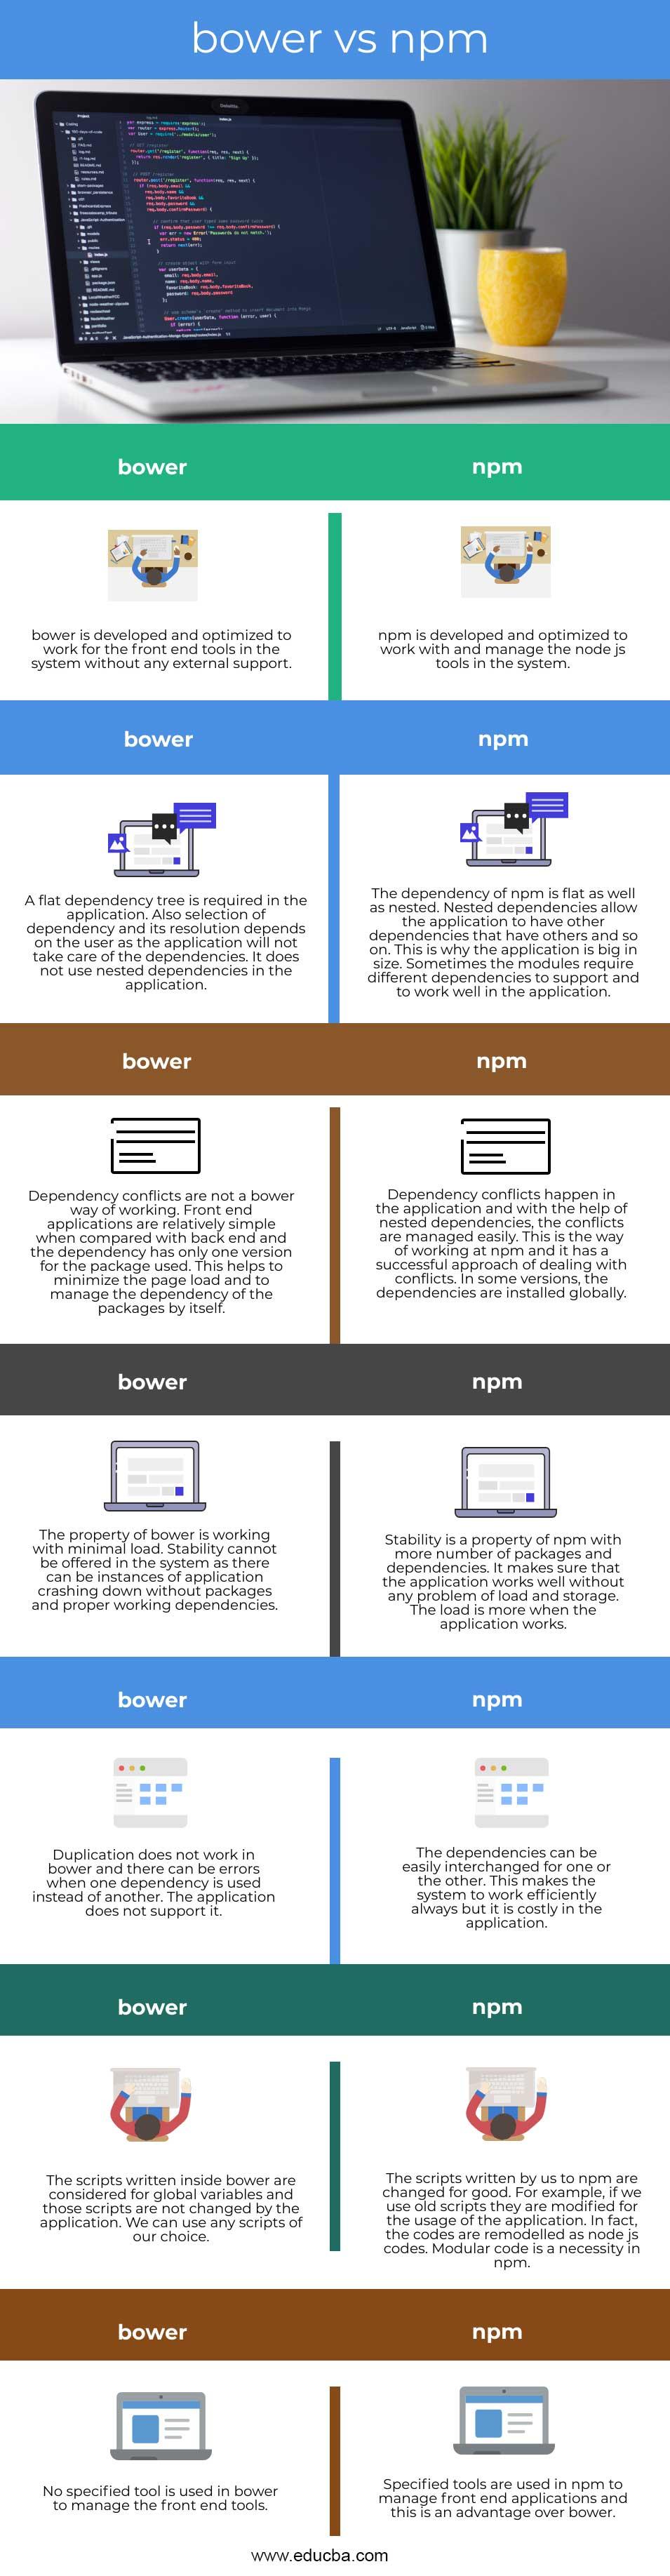 bower-vs-npm-info